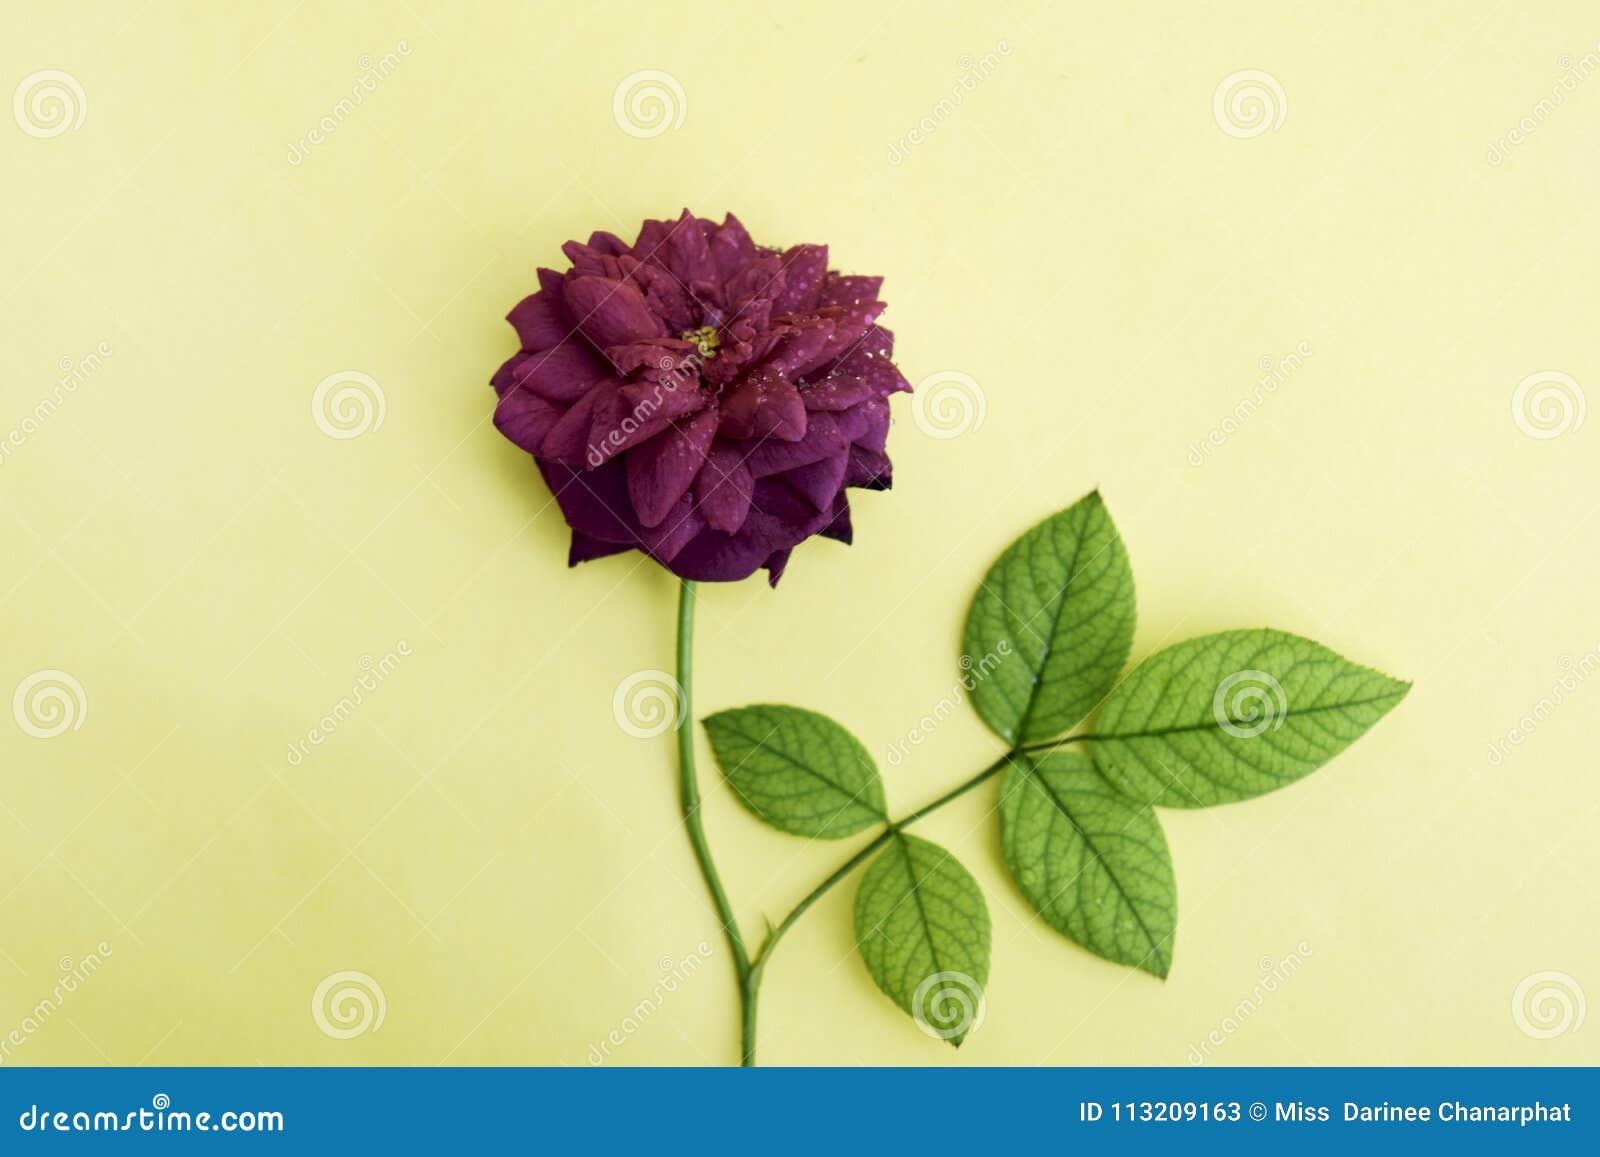 Zachte nadruk, gele achtergrond en mooie rode rozen